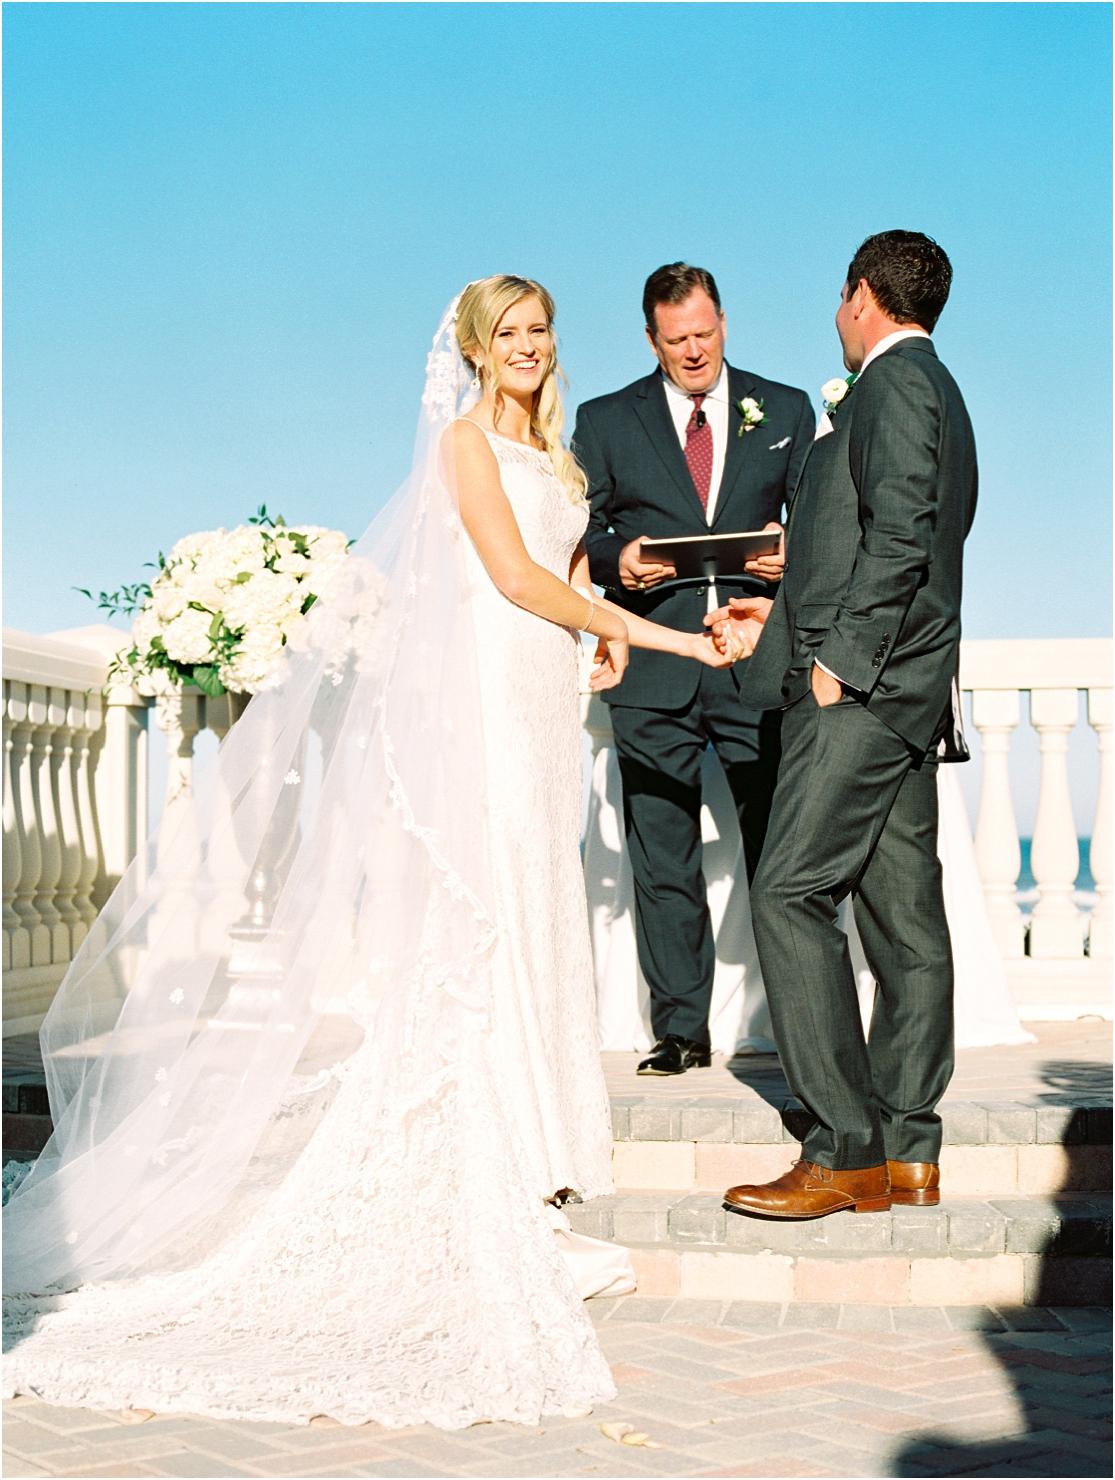 Lisa Silva Photography- Ponte Vedra Beach and Jacksonville, Florida Fine Art Film Wedding Photography- Wedding at the Ponte Vedra Inn and Club_0052.jpg